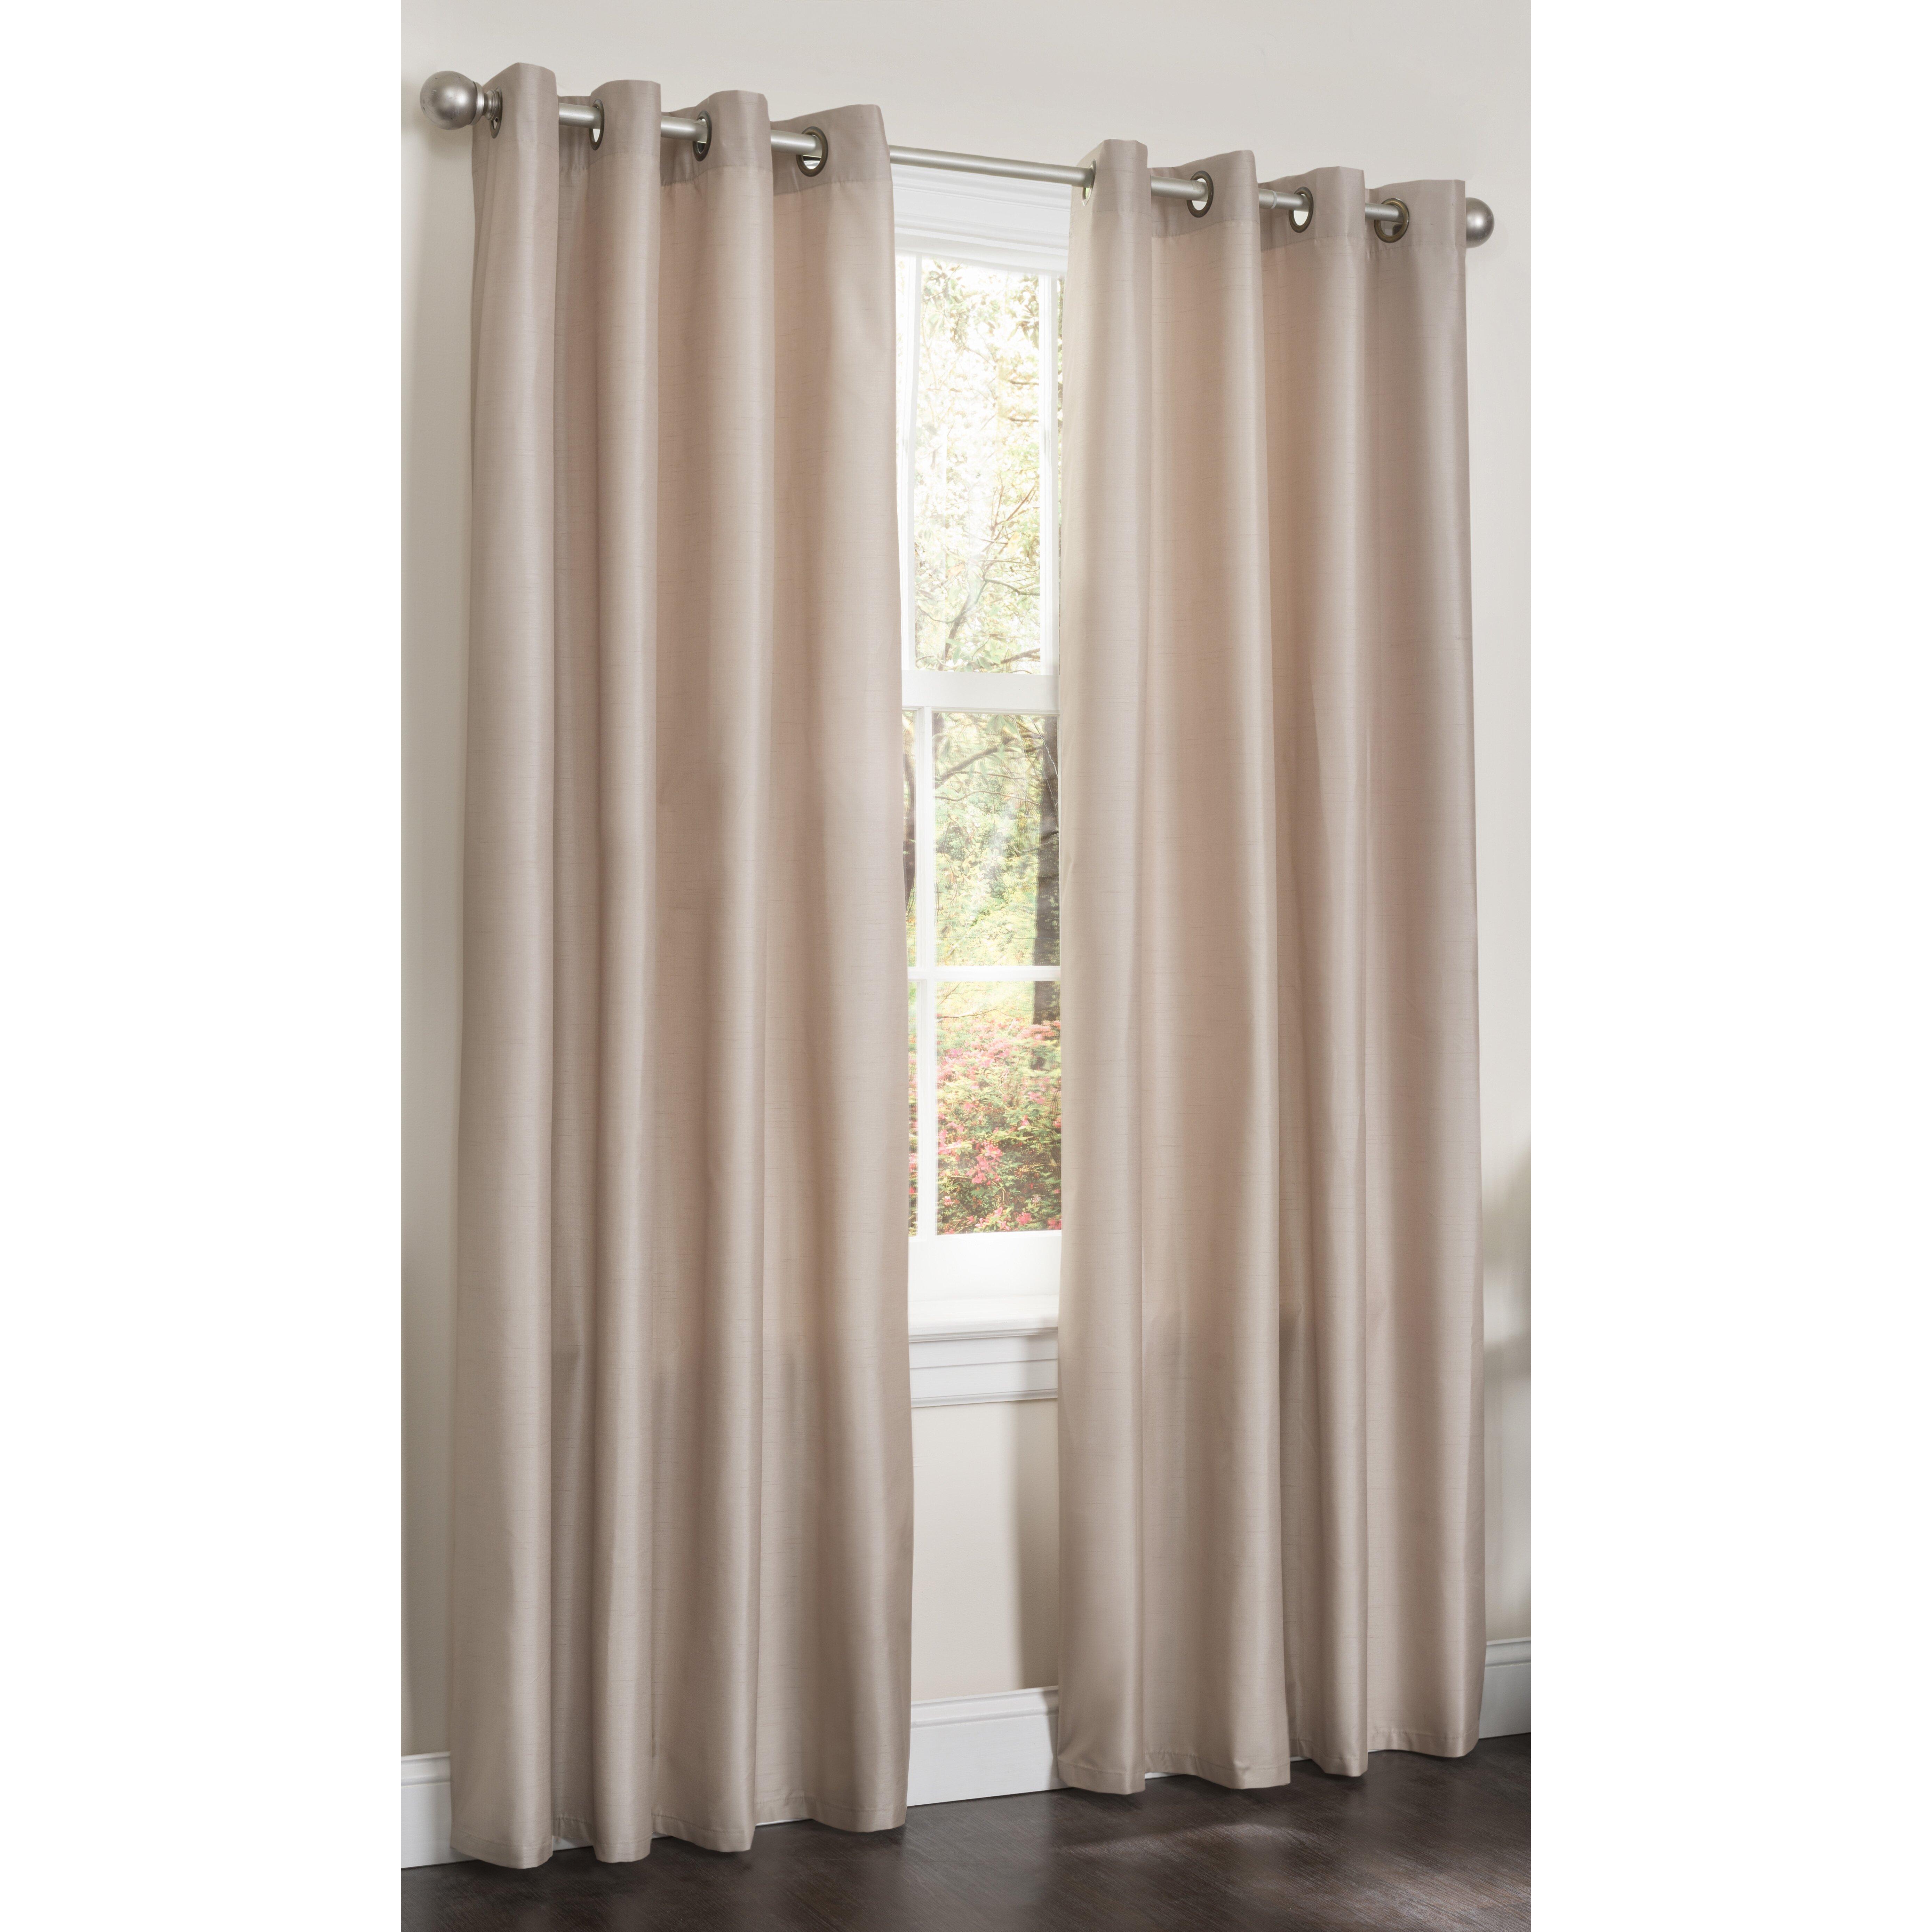 Kashi Home Erin Curtain Panel & Reviews | Wayfair.ca